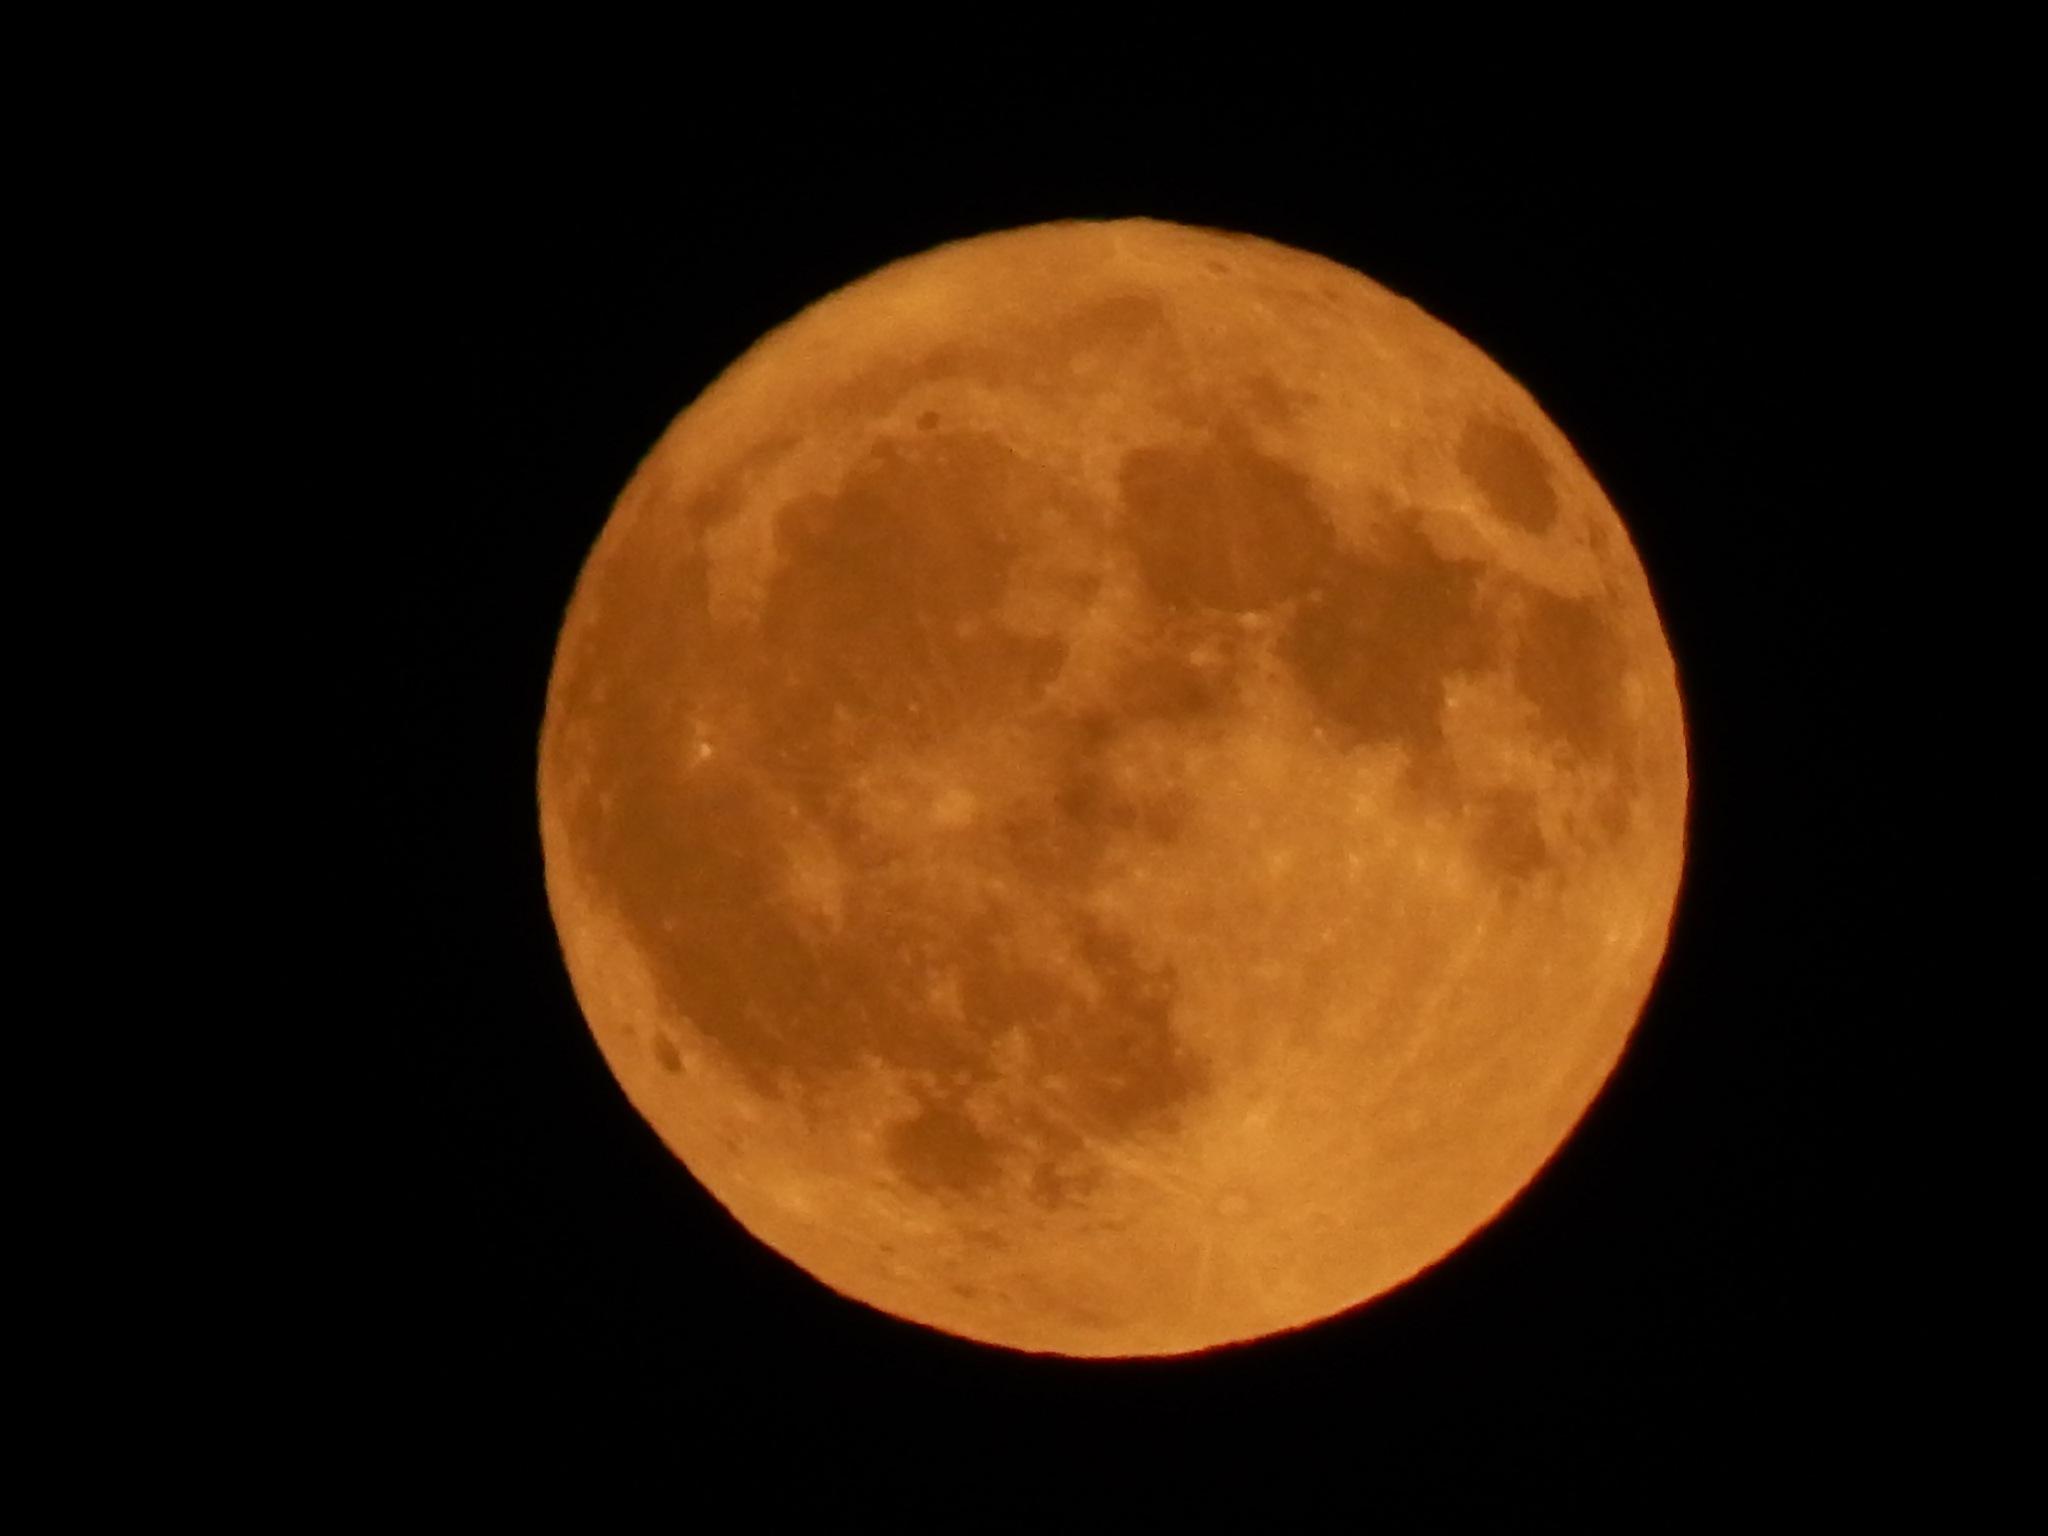 moon by Goran Vuletic